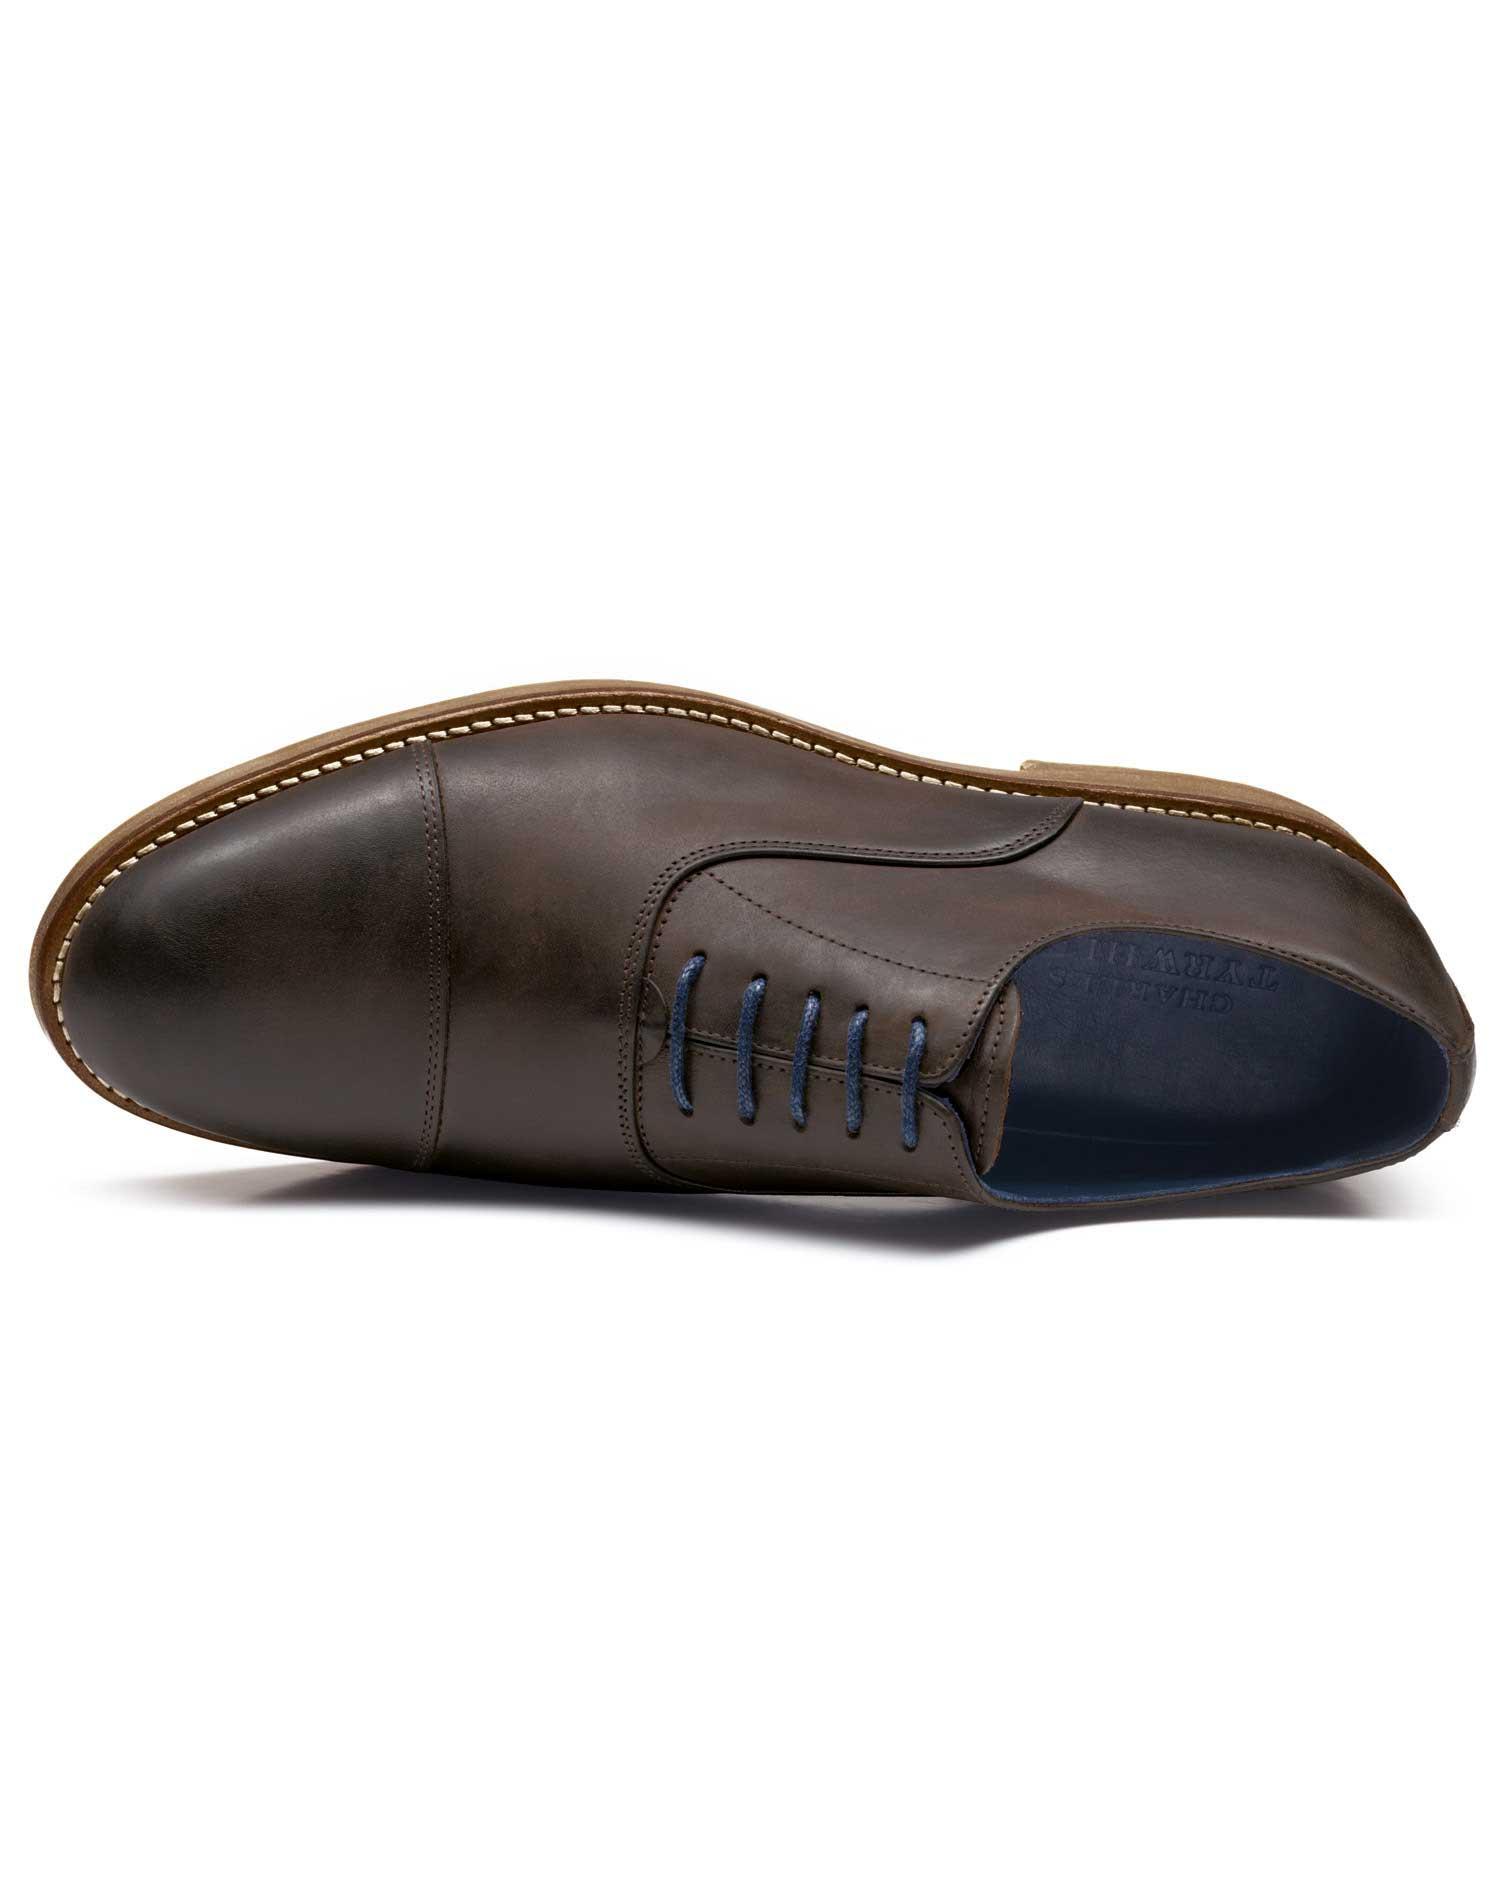 Brown Highbury Toe Cap Oxford Shoes Size 7 R by Charles Tyrwhitt